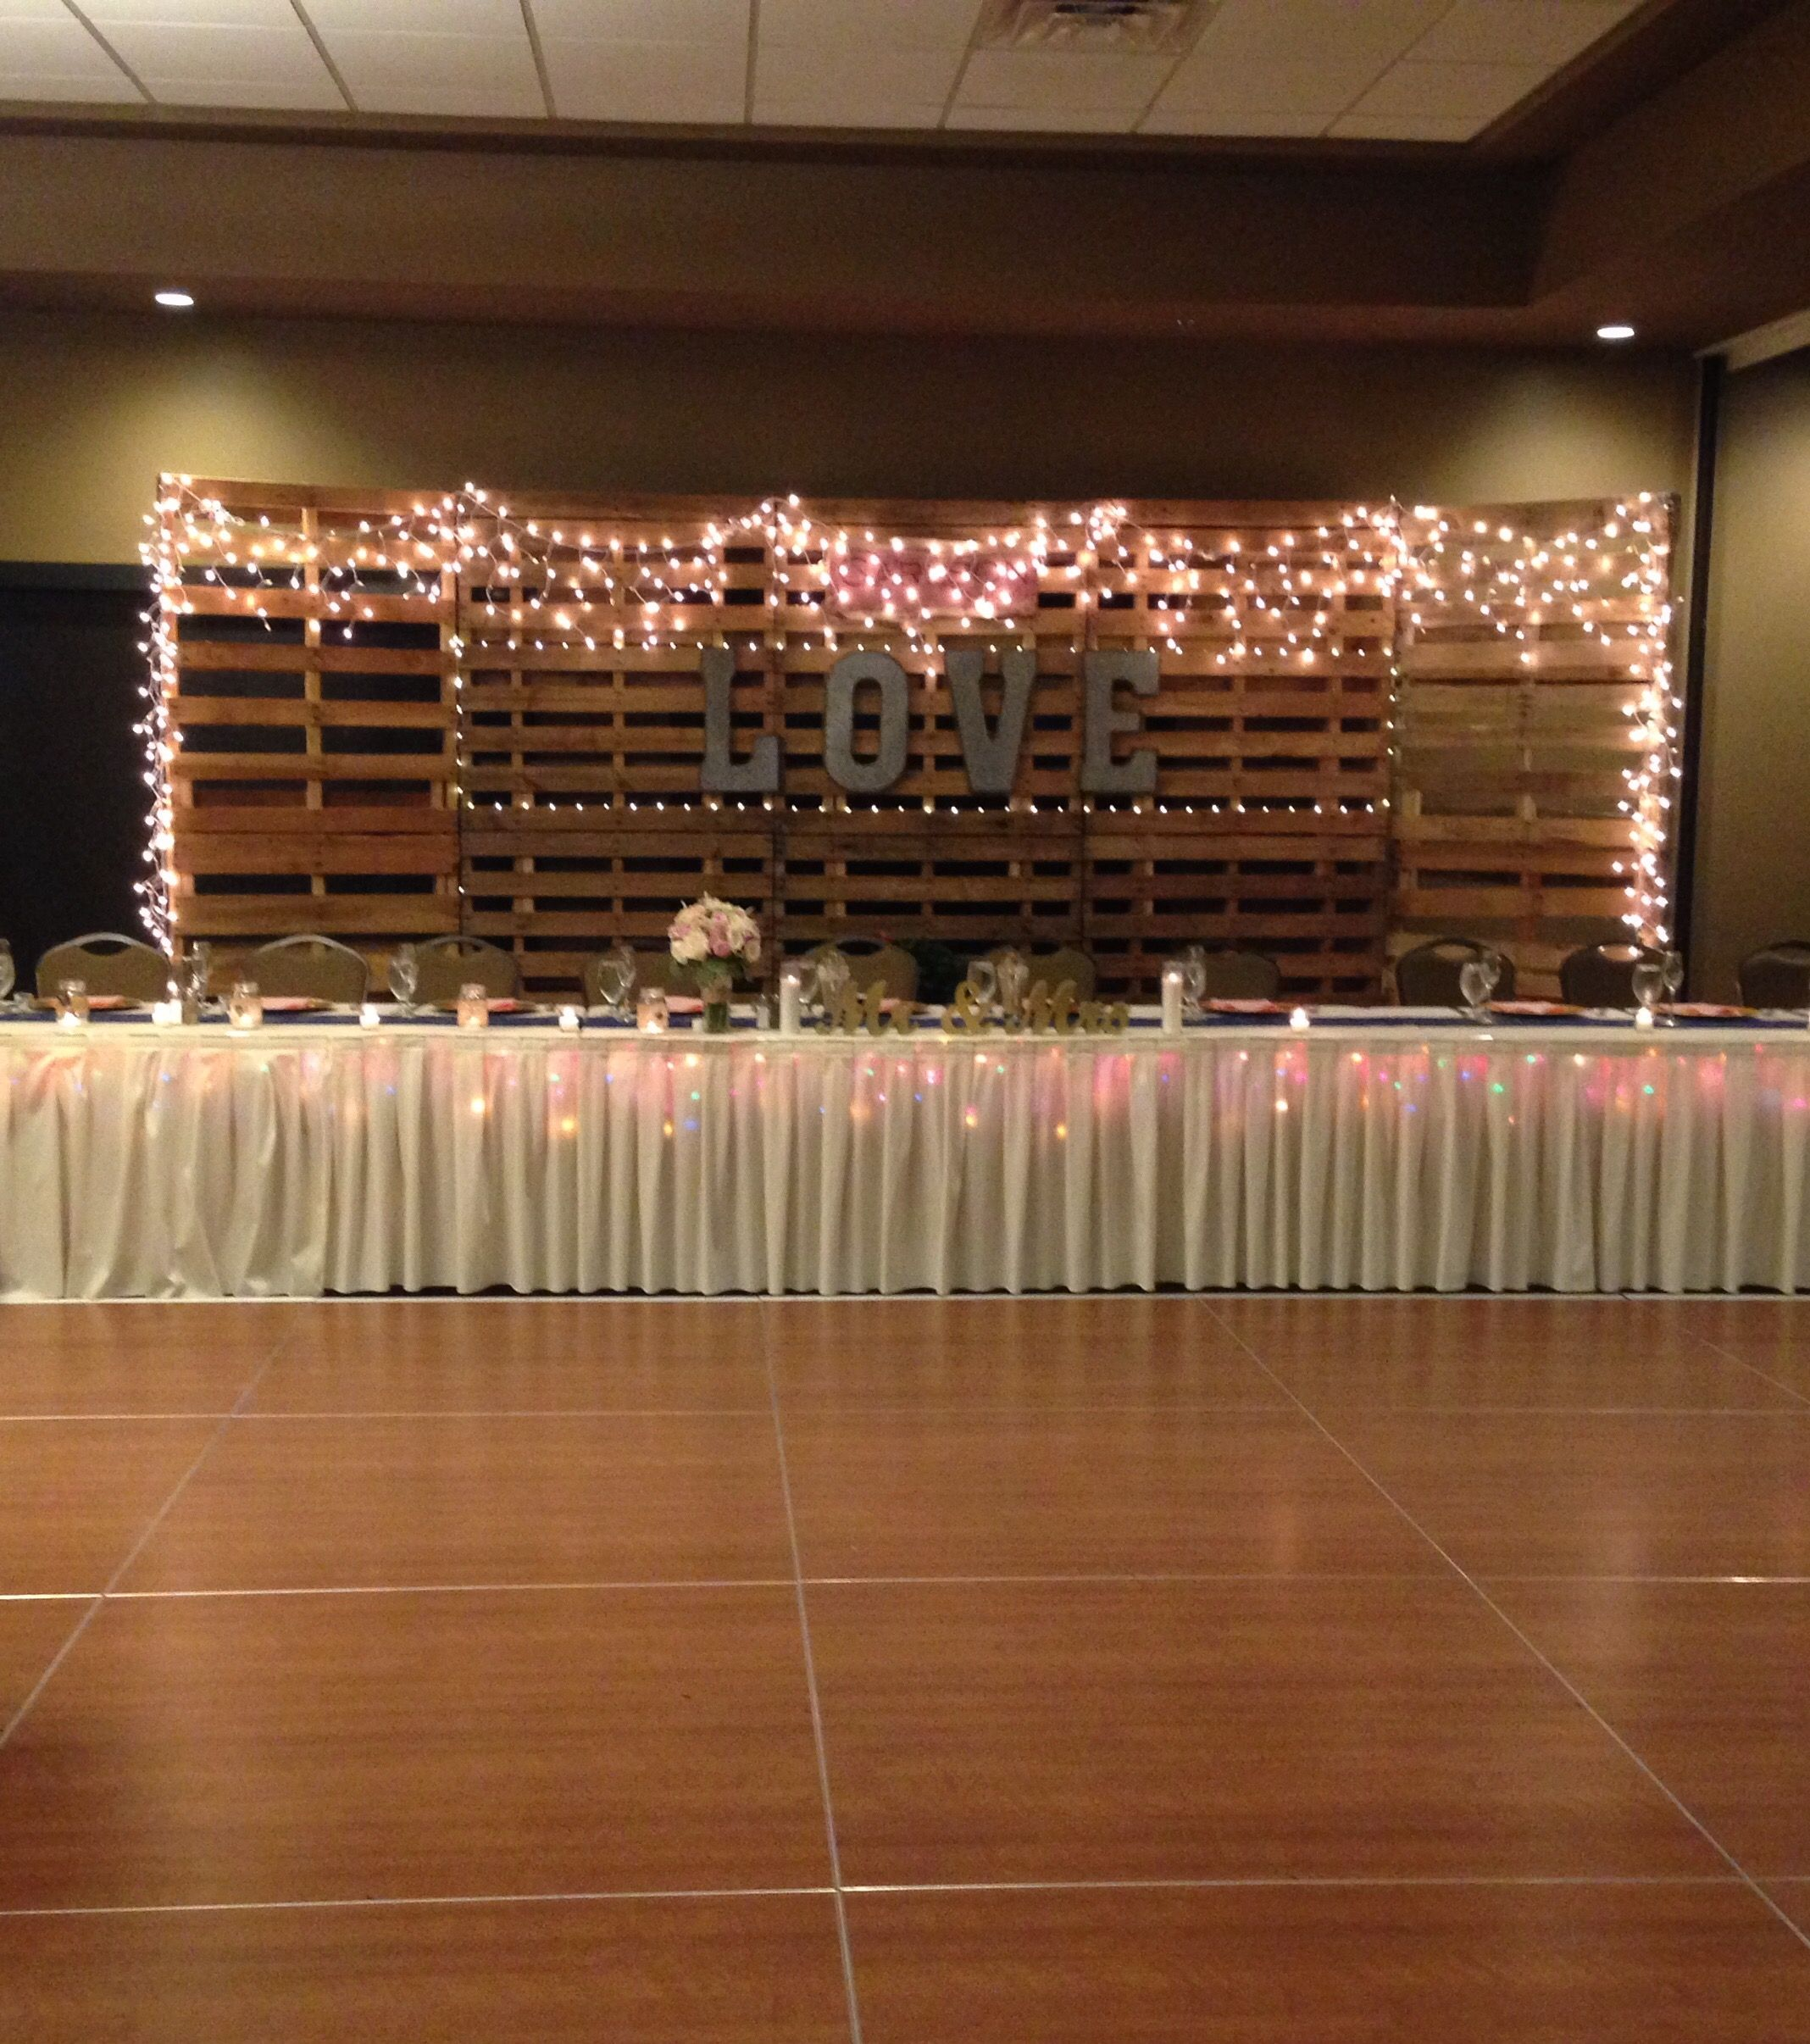 Rustic Barn Wedding Backdrop Ideas: Rustic Backdrop For The Head Table. #bigBRUKENdeal